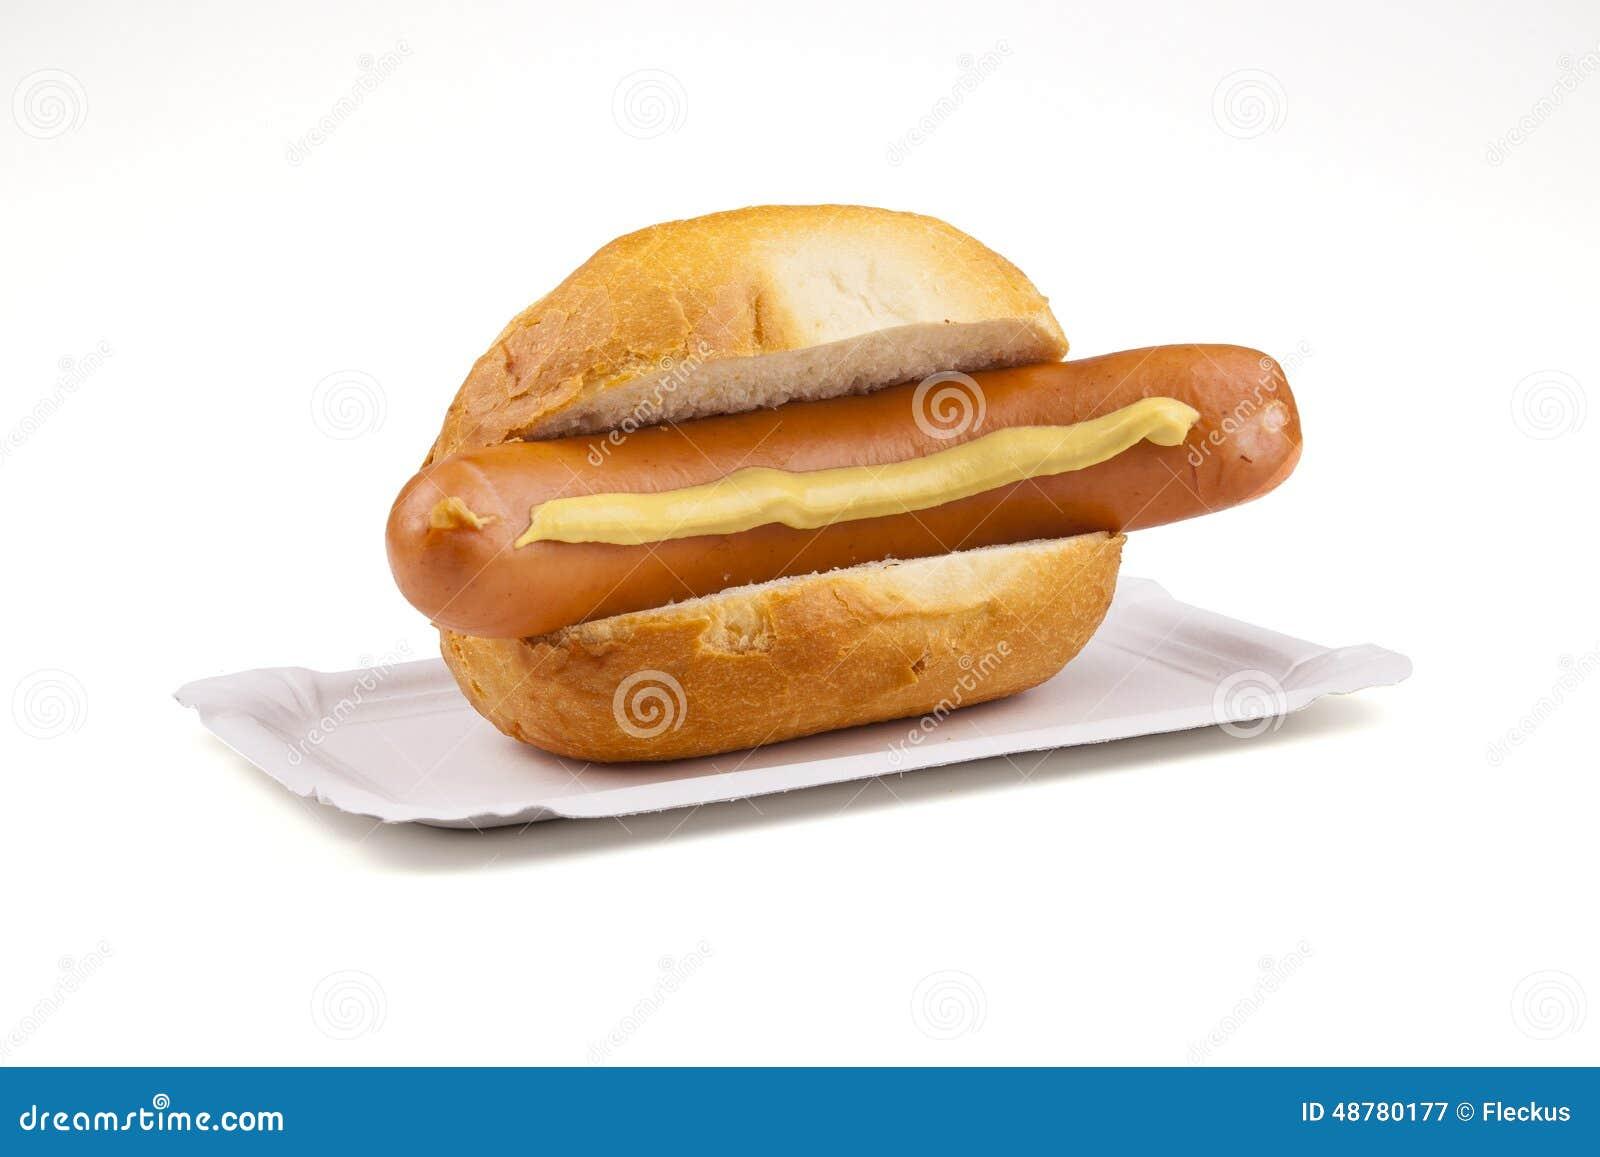 German Sausage - Deutsche Bockwurst Stock Image